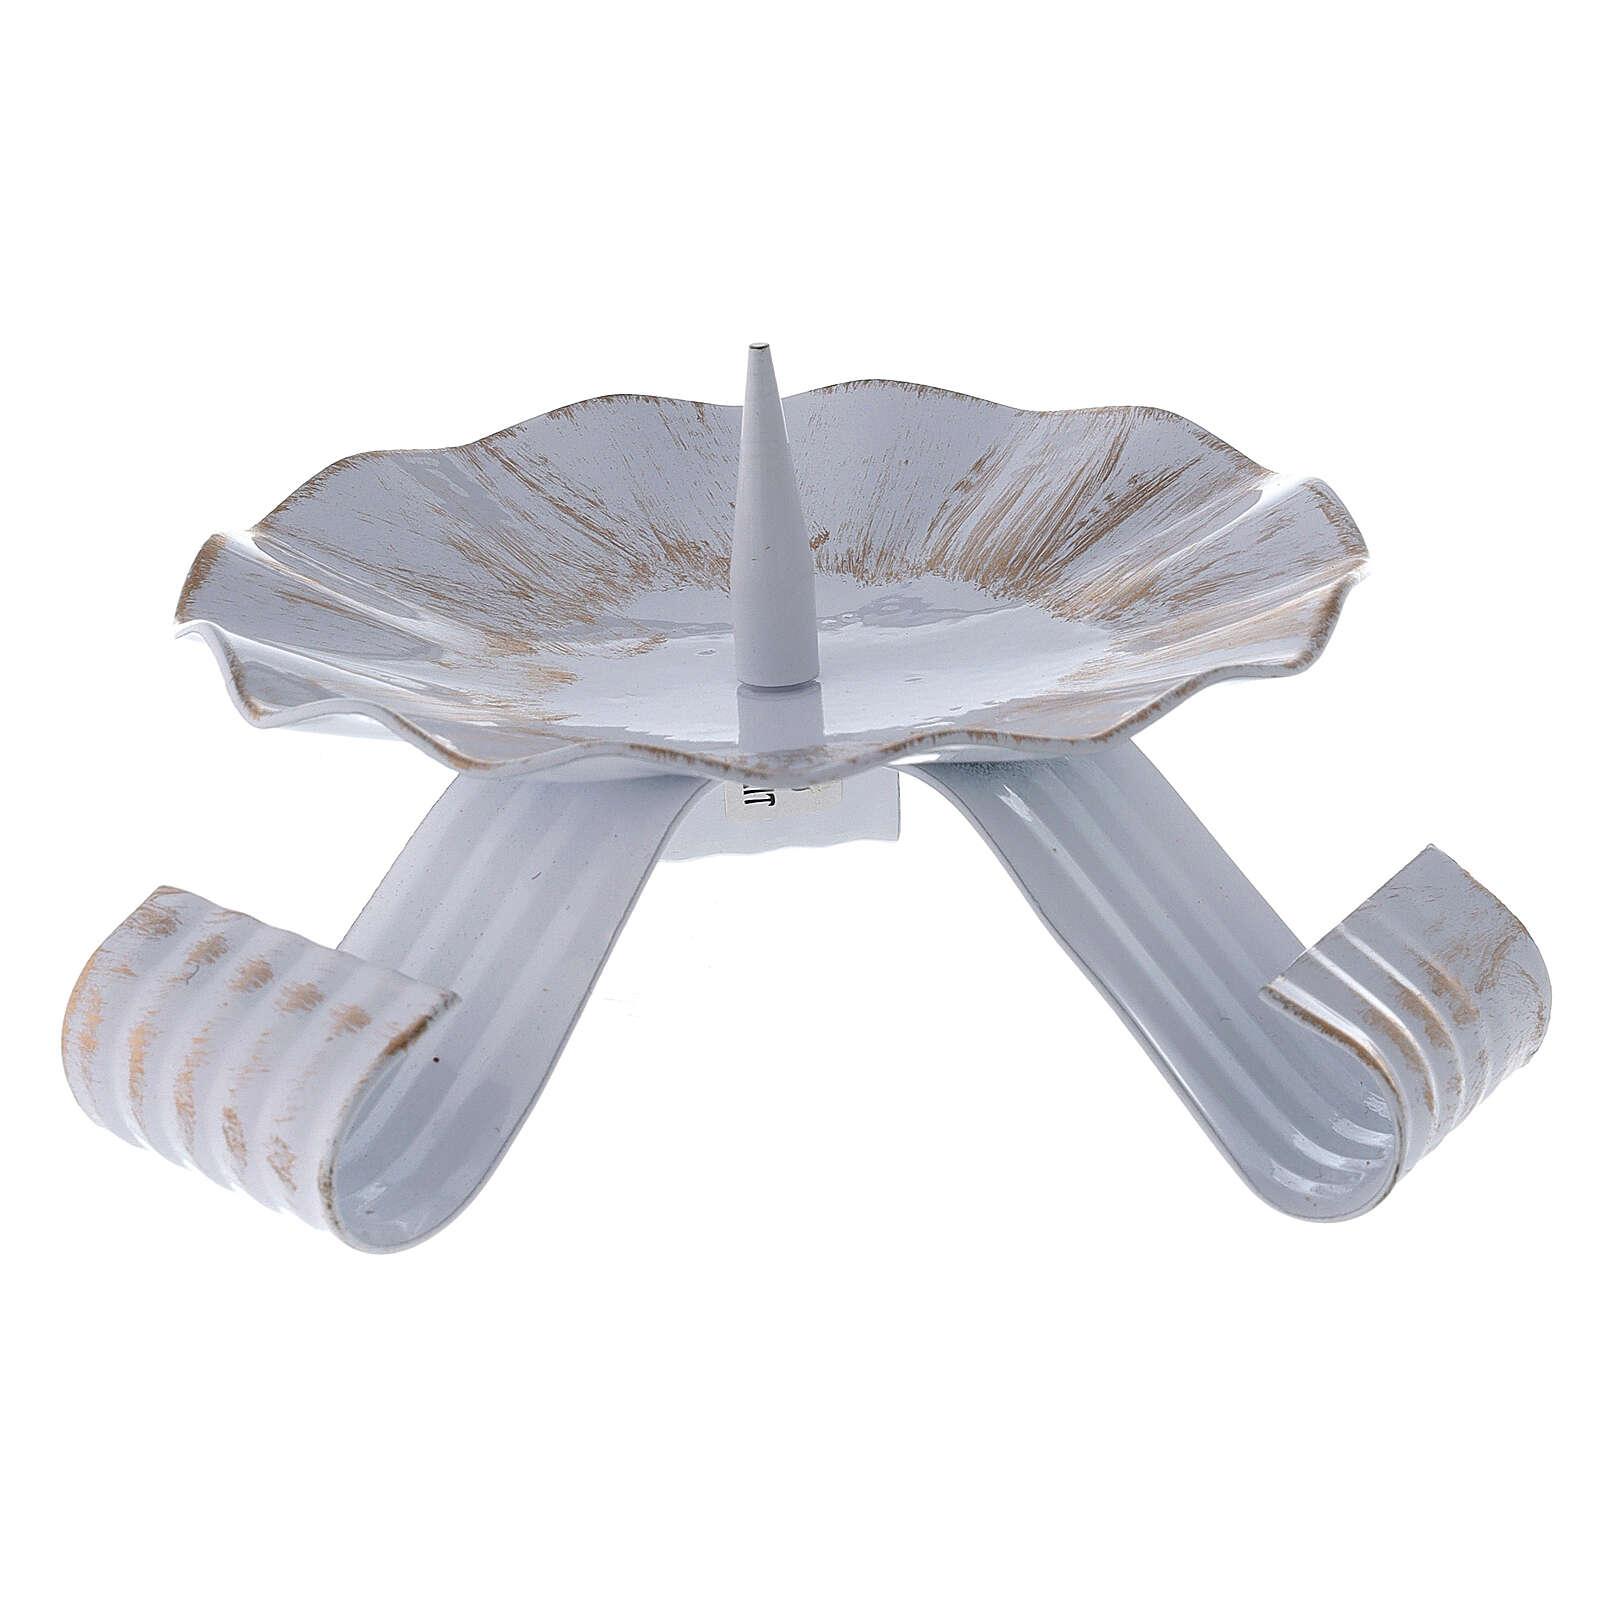 Portacandela punzone ferro bianco oro piedi arricciati 12,5 cm 3